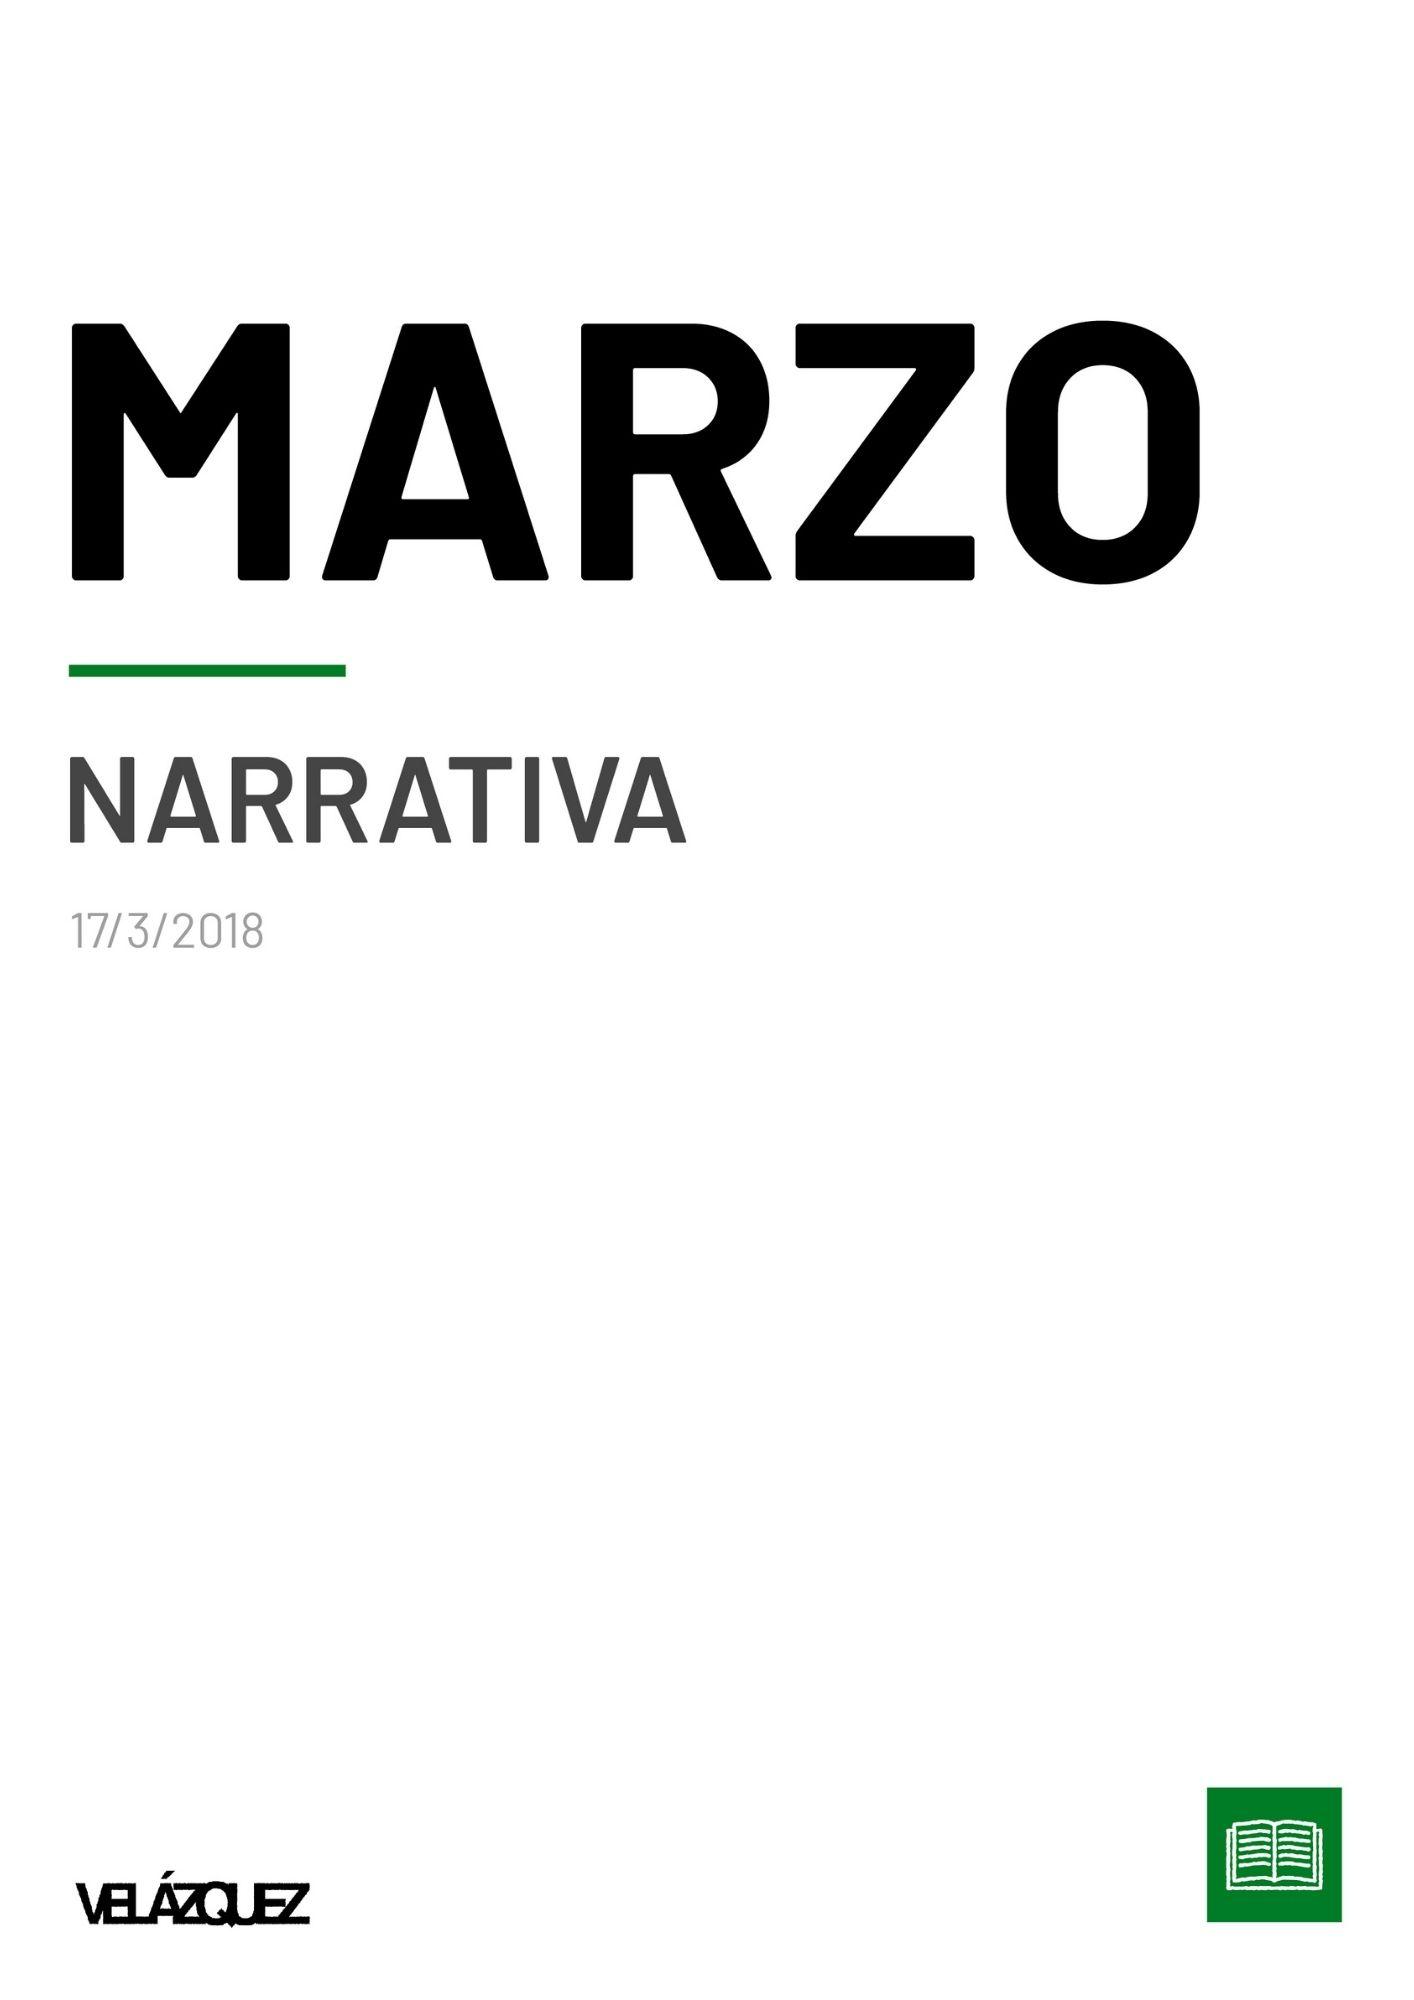 Marzo - Narrativa - Fabri Velázquez